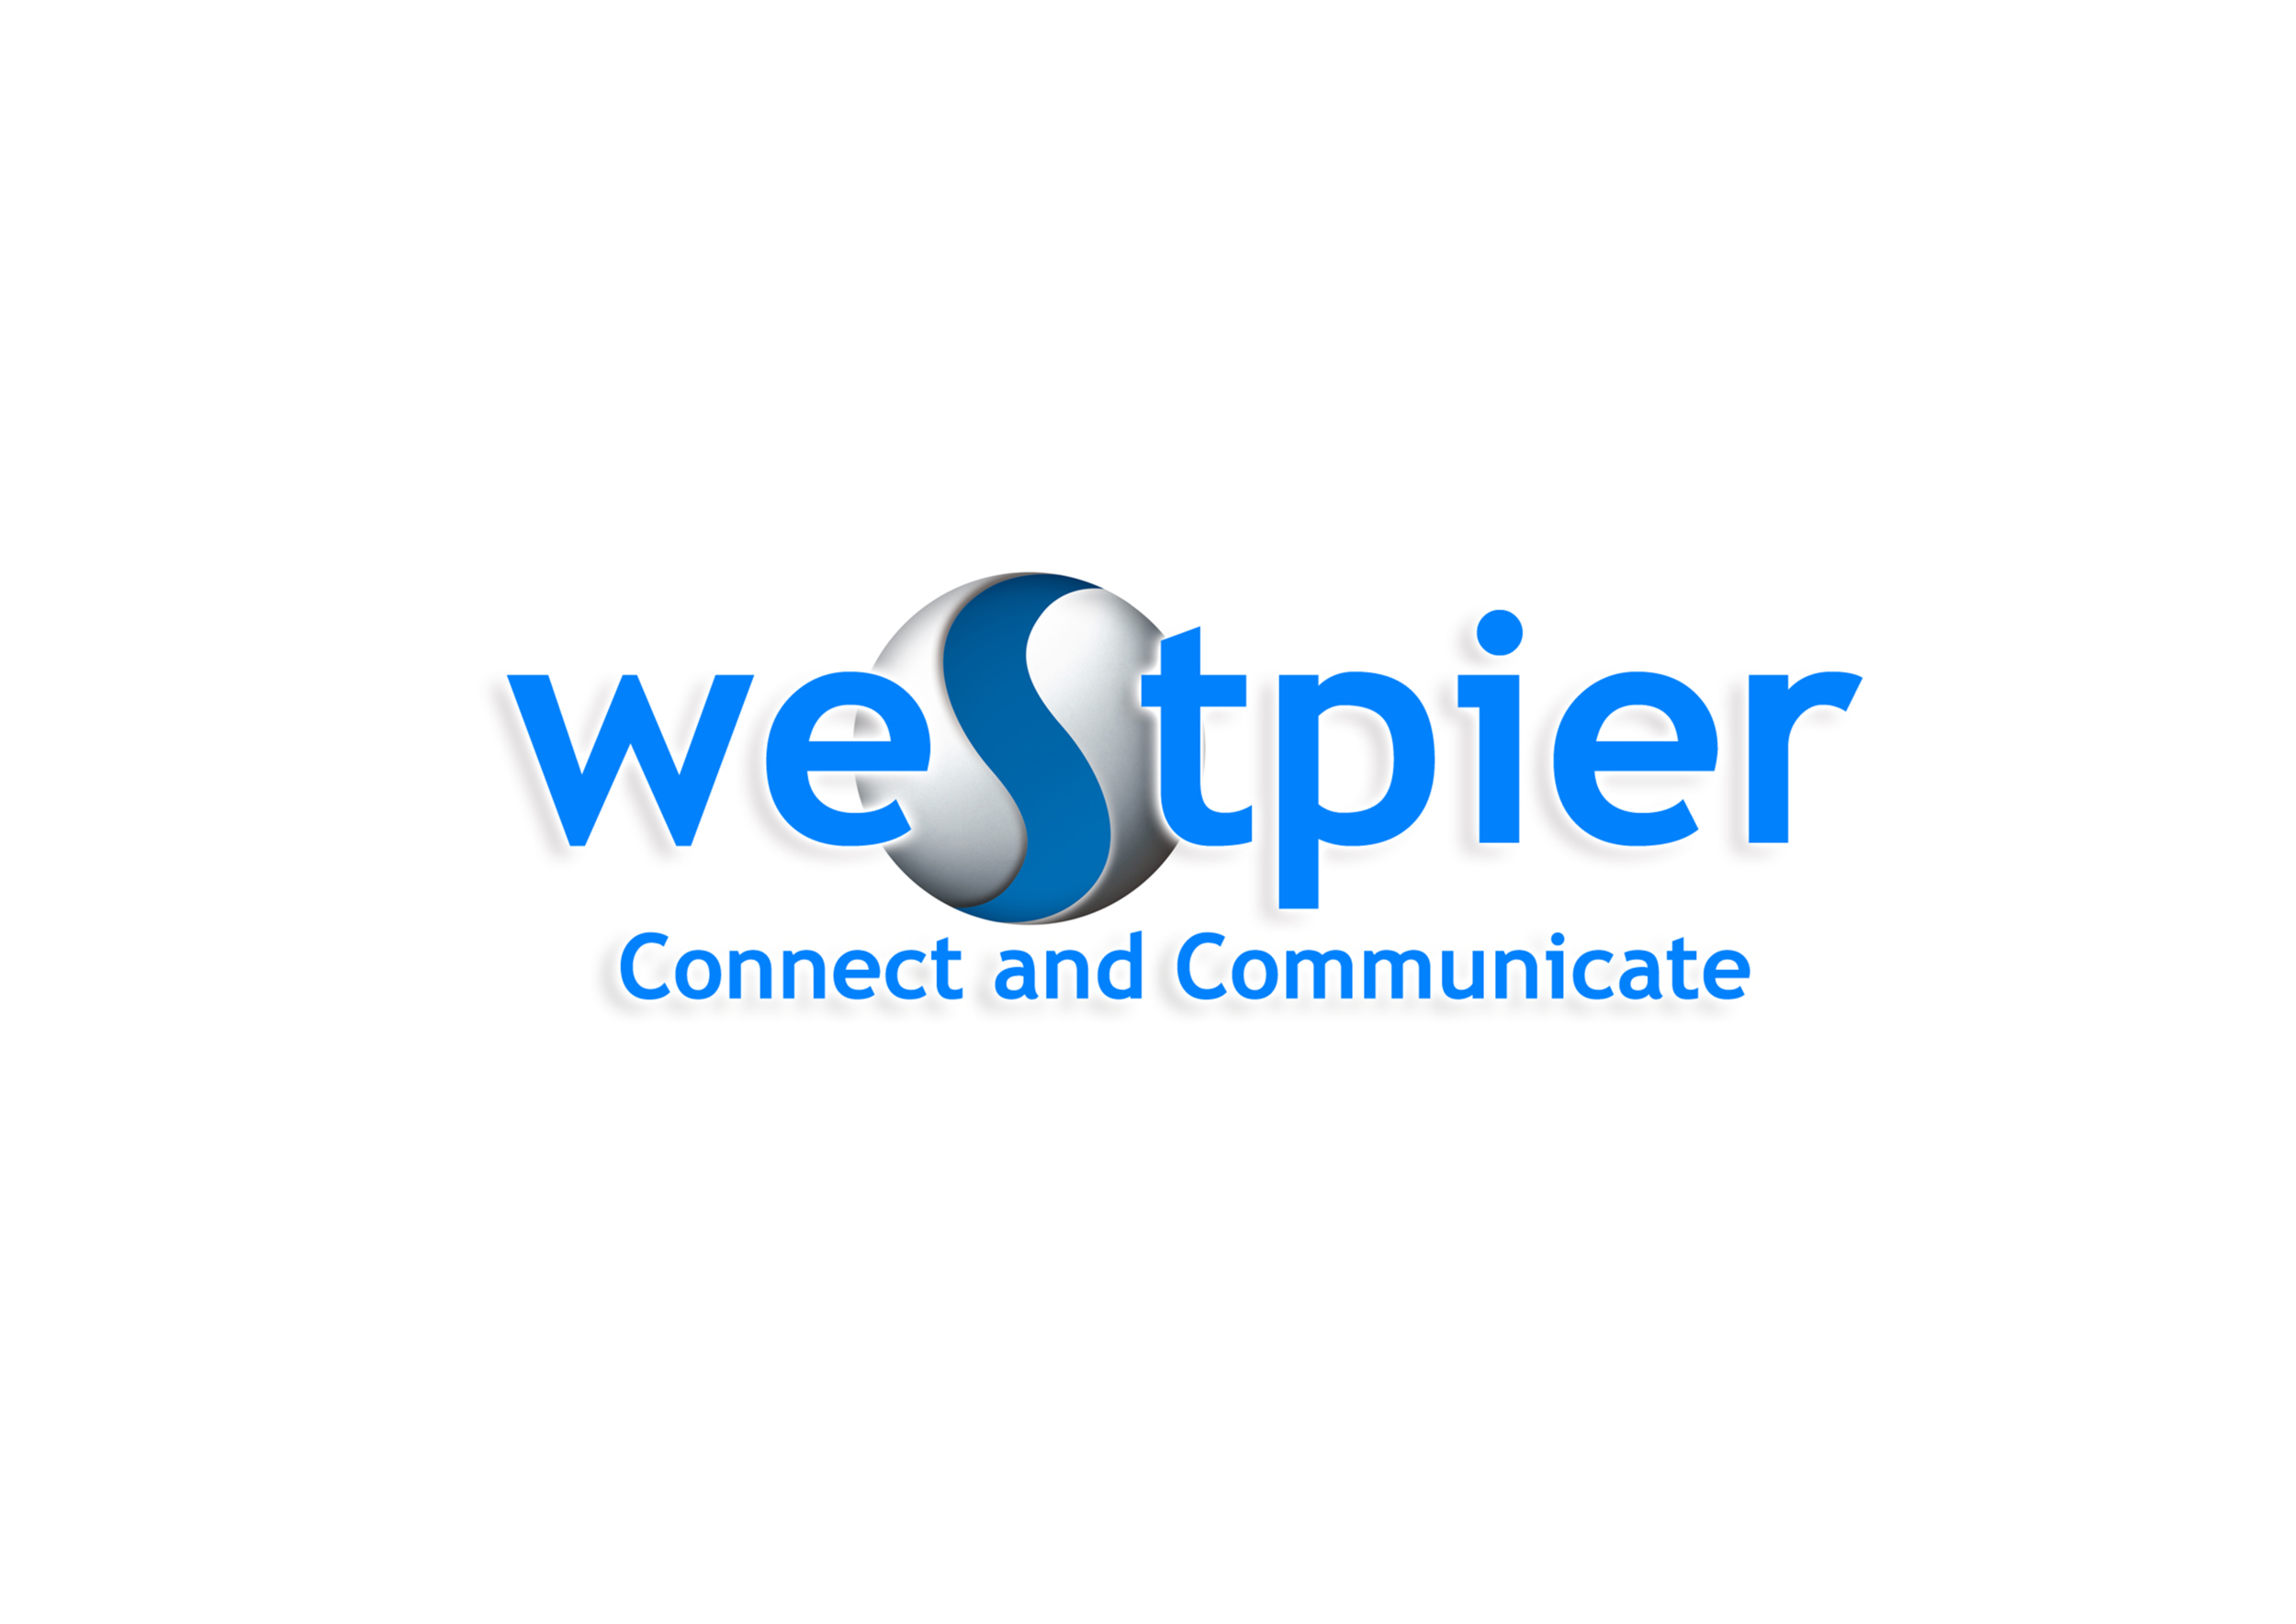 Westpier.png